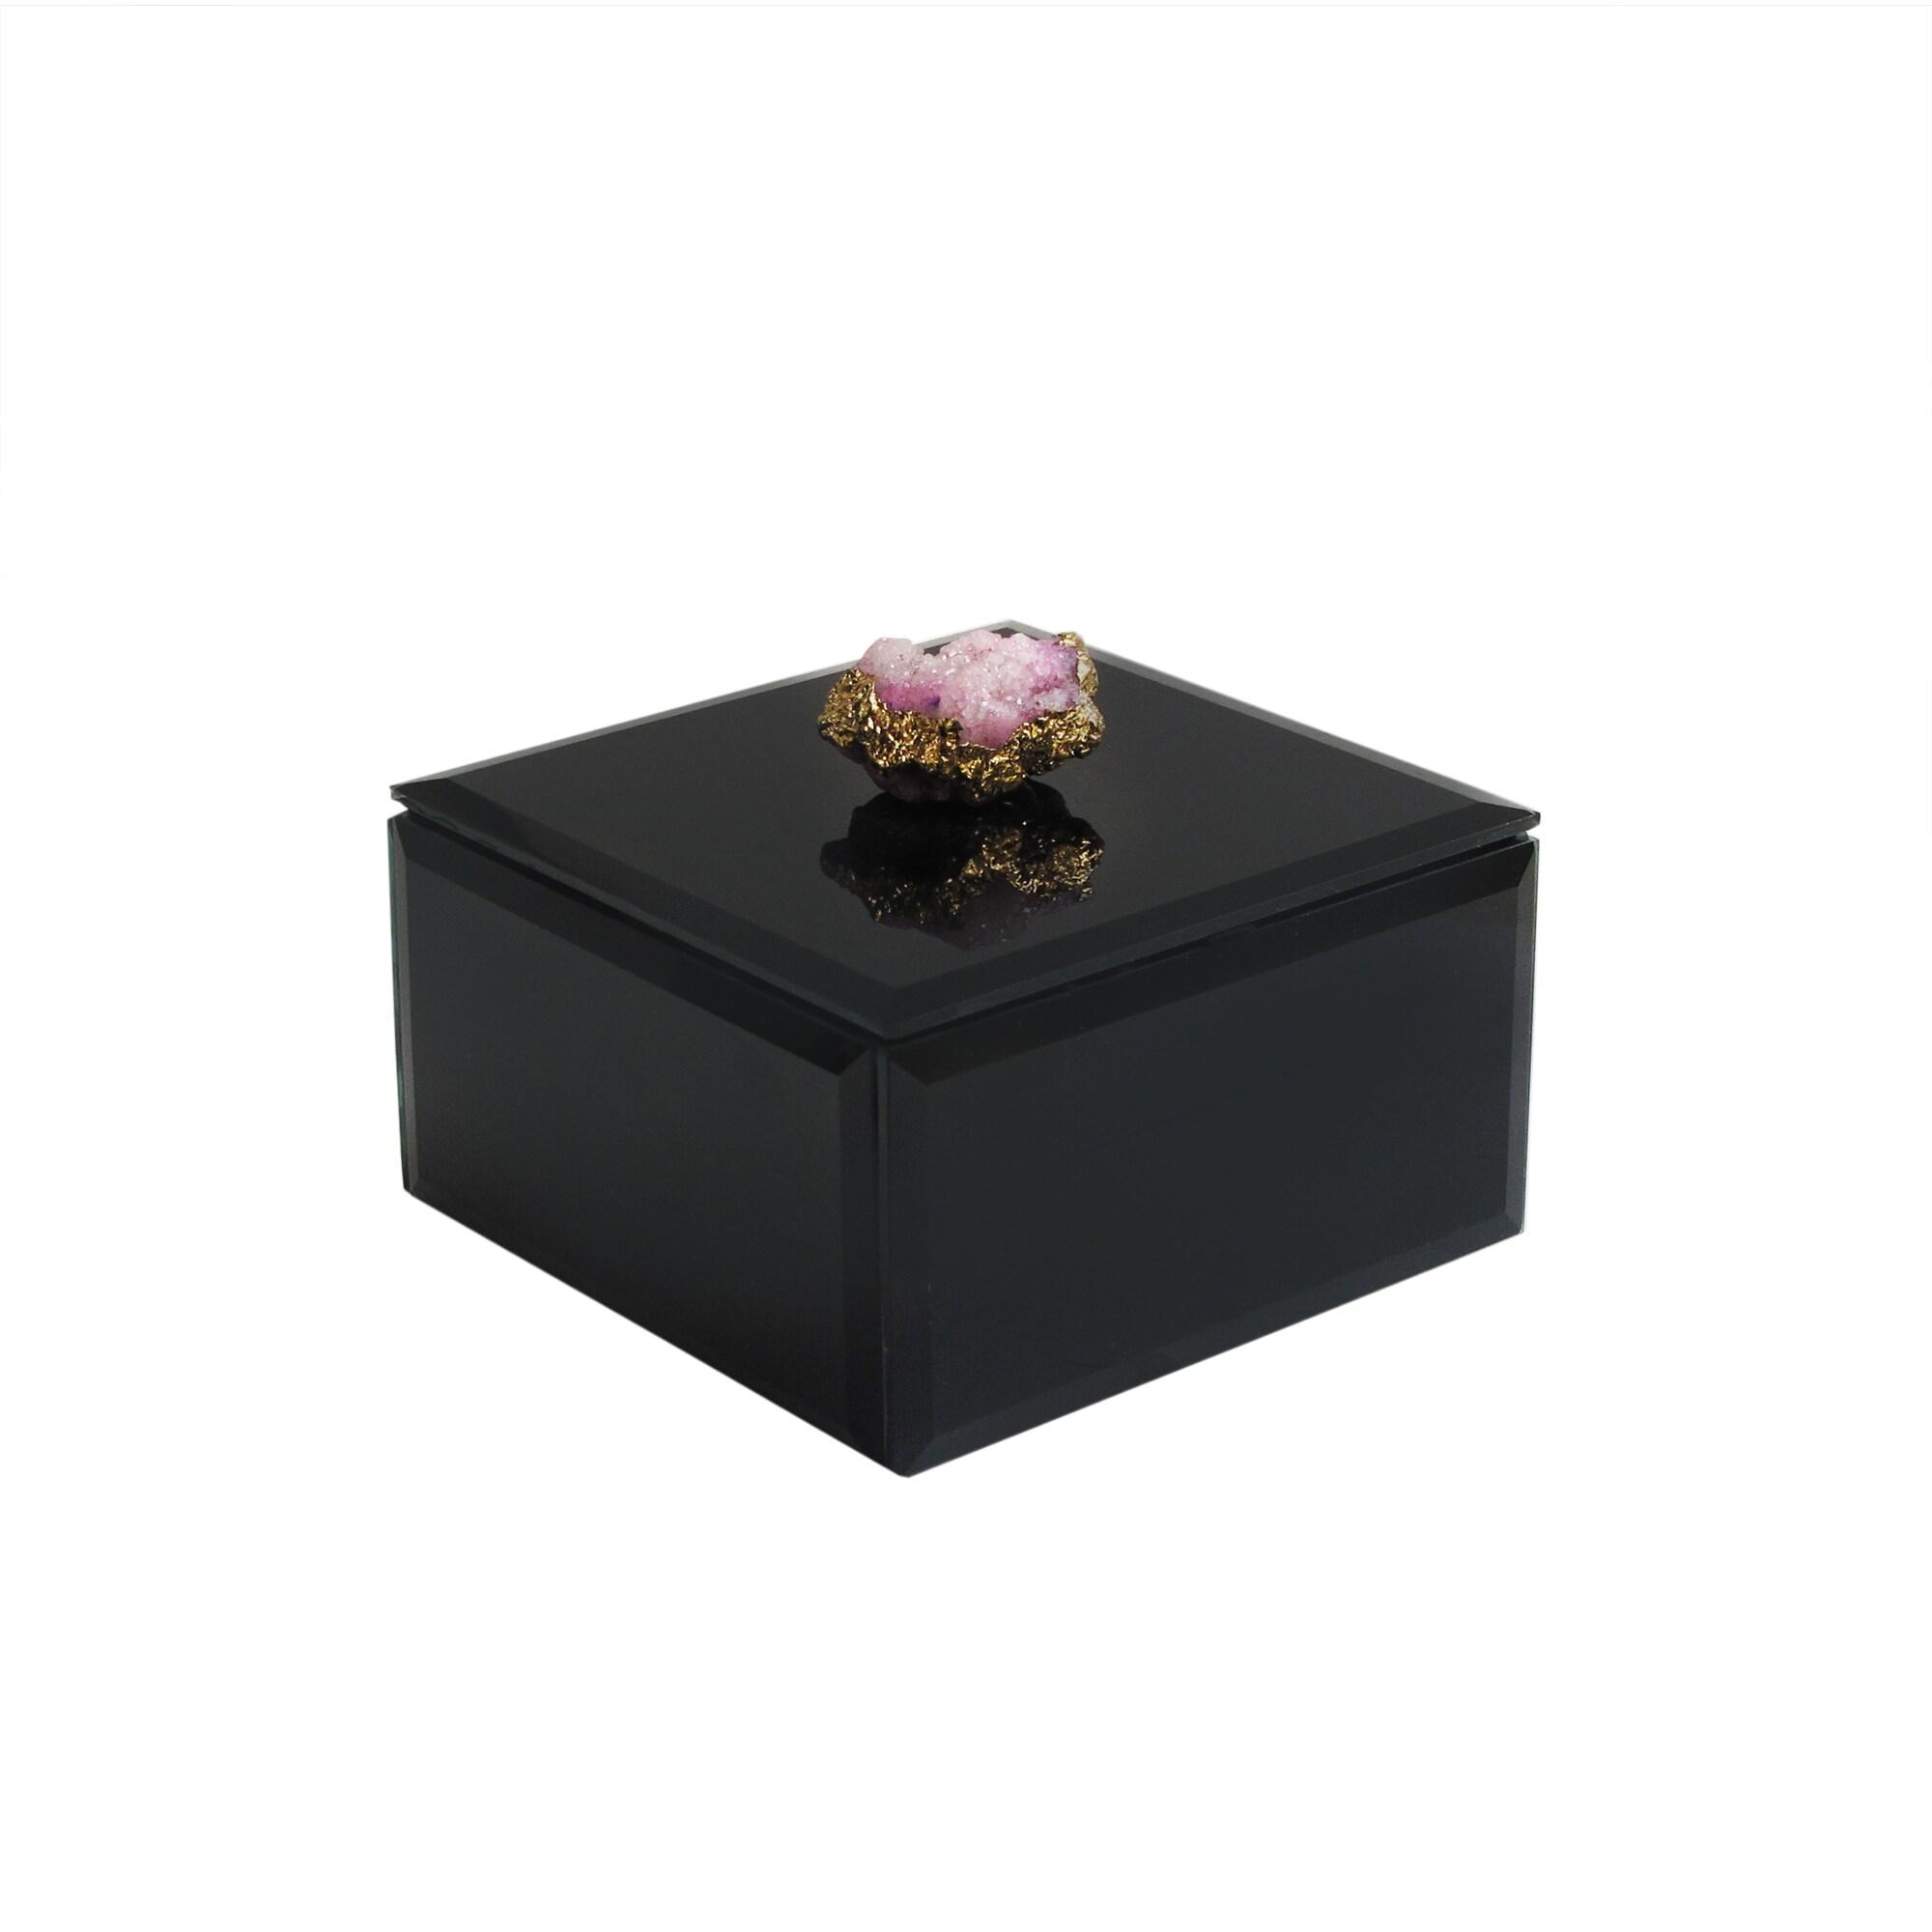 "Allure by Jay Agate Black Box 4.5 x 4.5 x 2.5"""